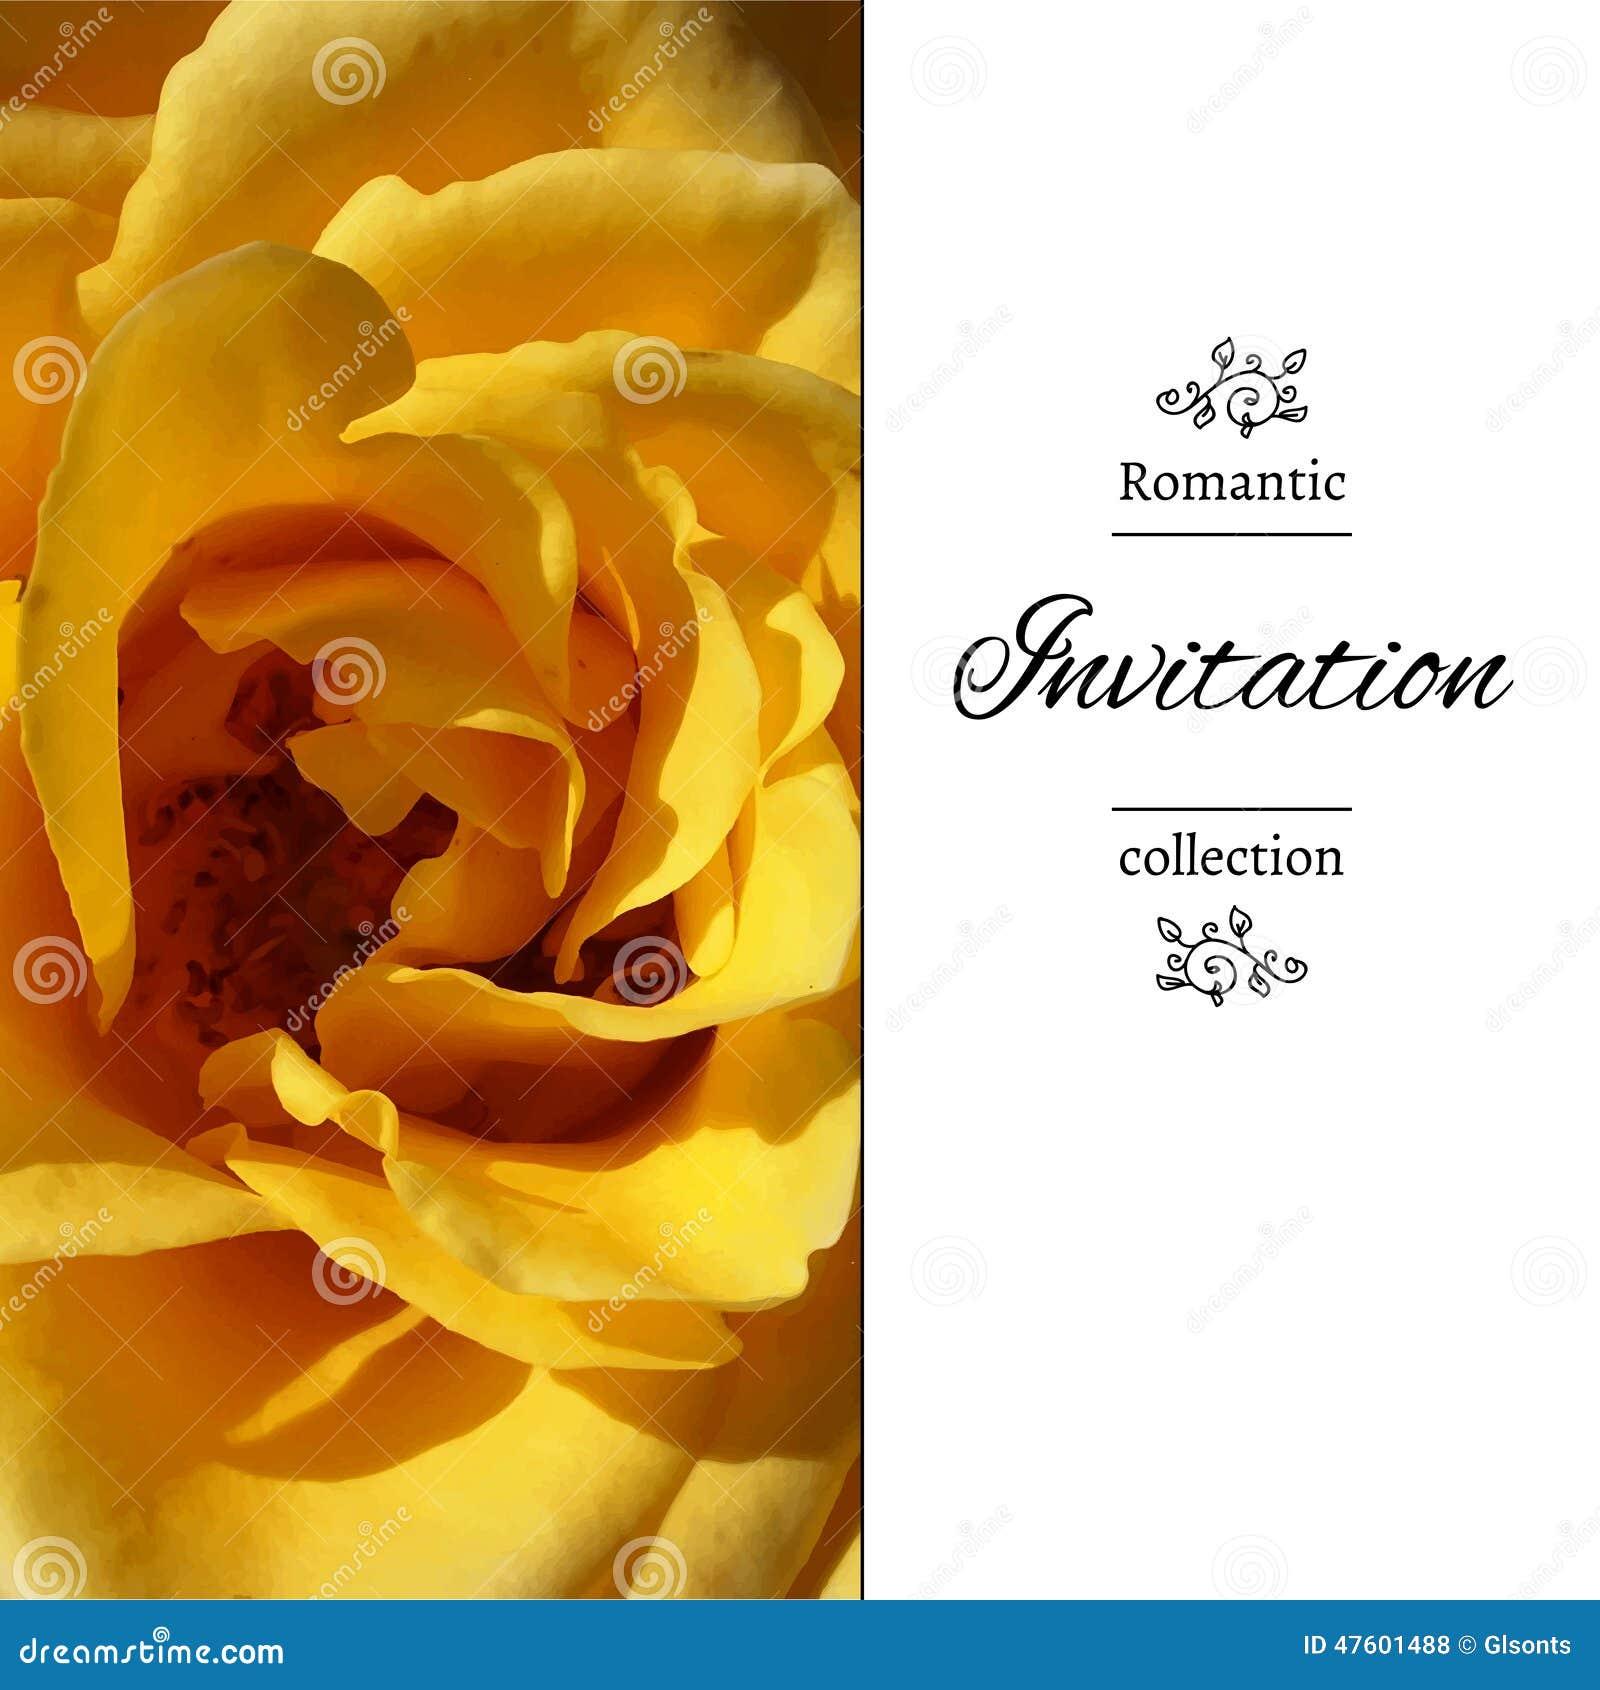 wedding invitation in romantic style eps jpg stock vector